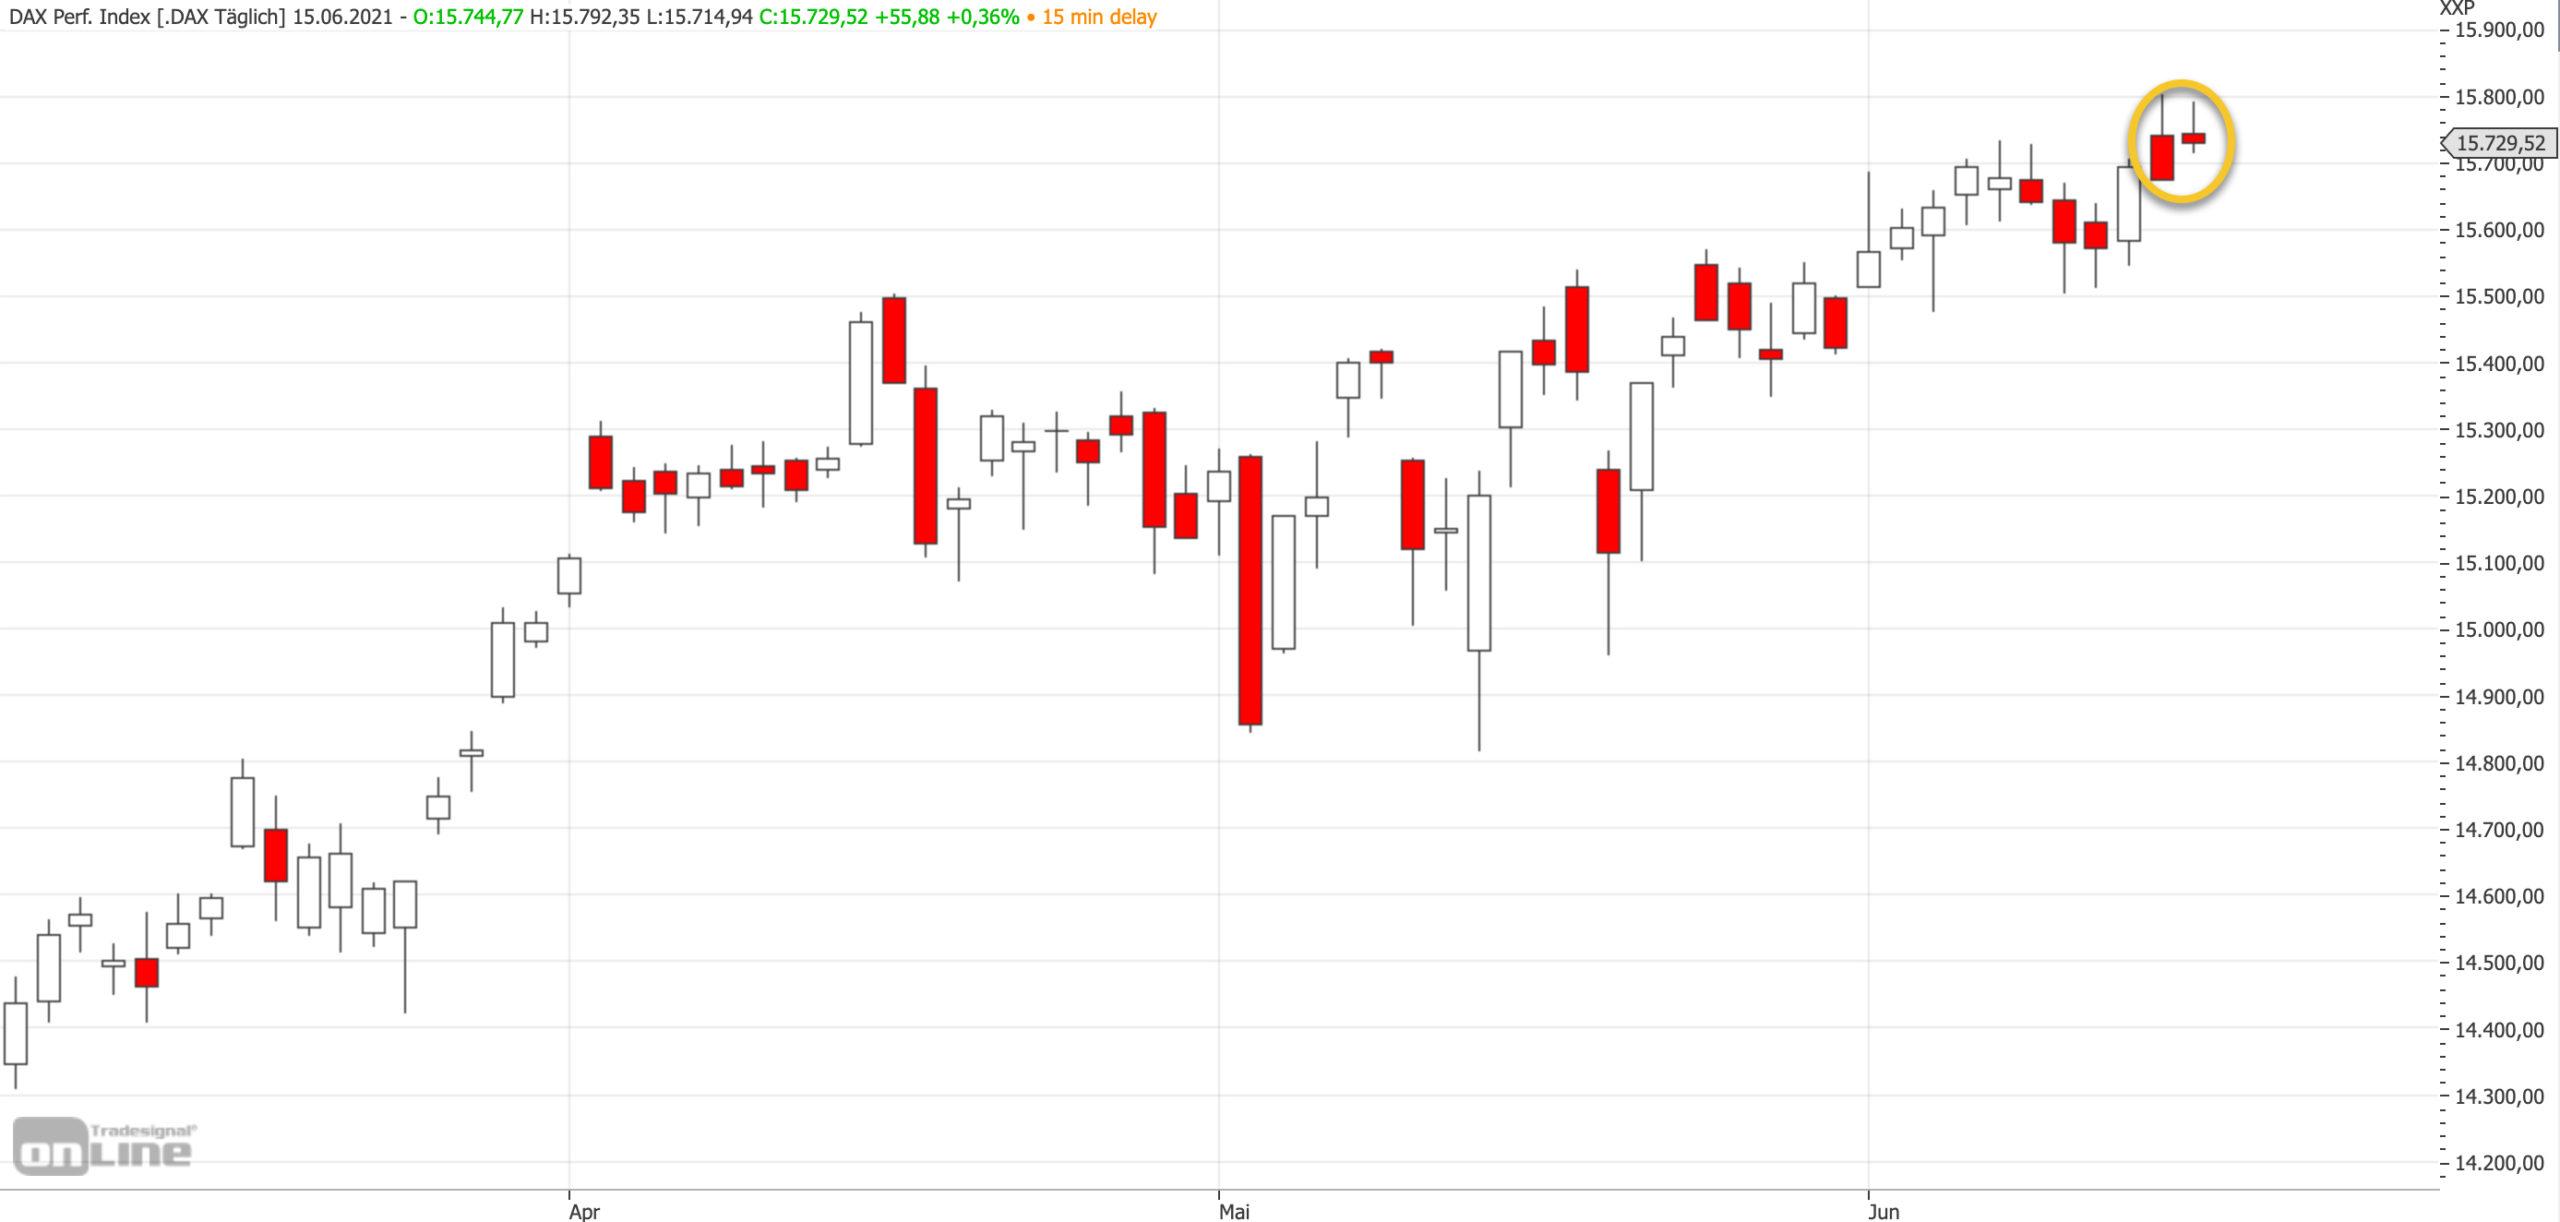 Mittelfristiger DAX-Chart am 15.06.2021